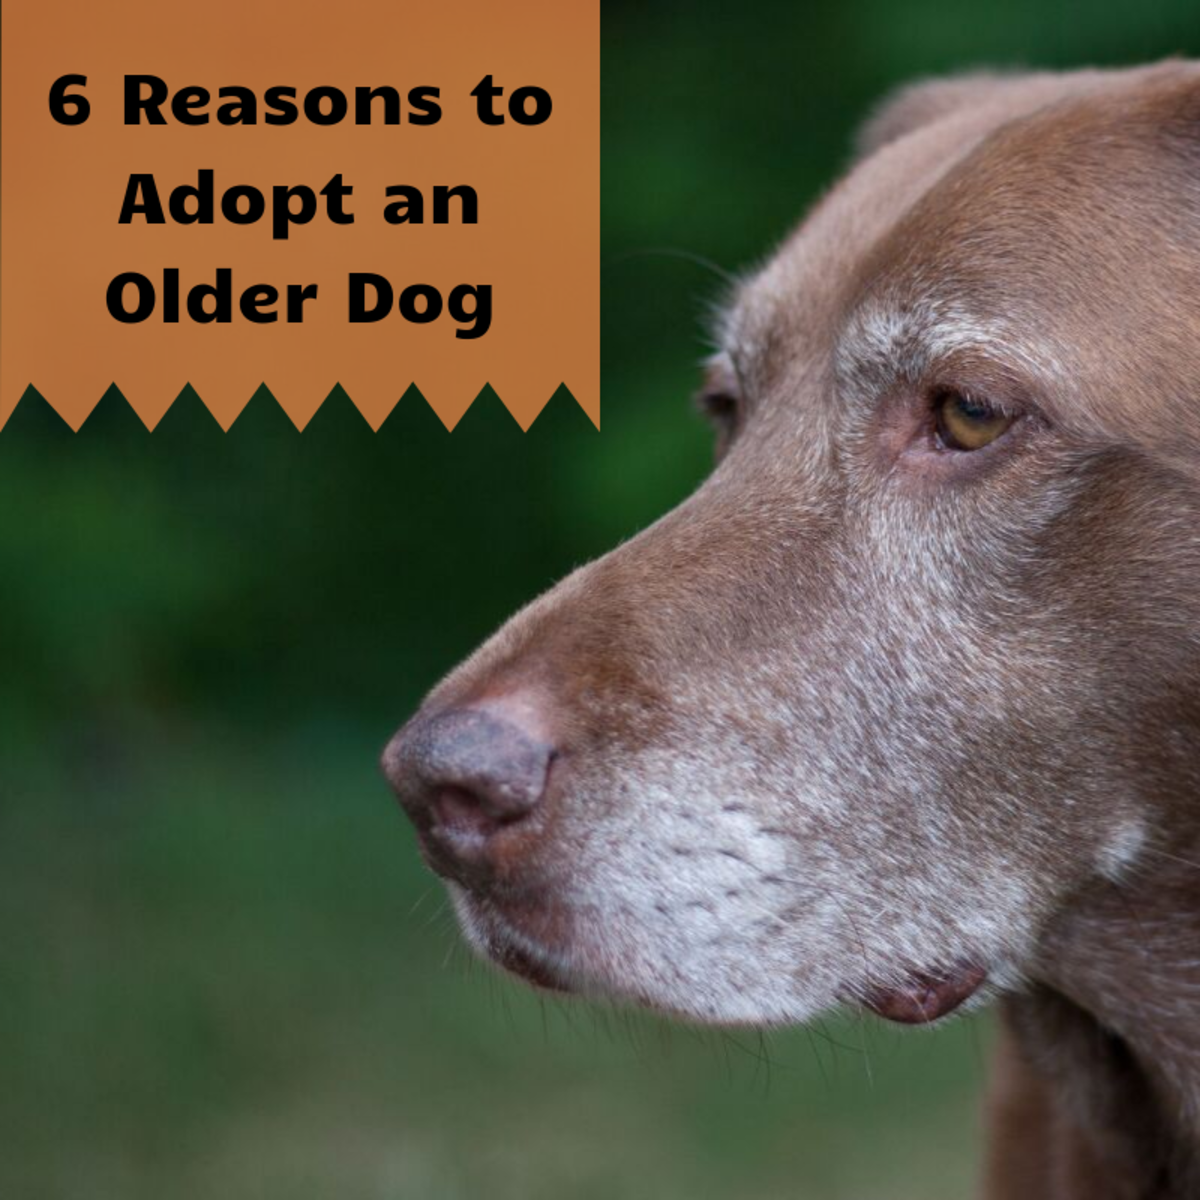 6 Reasons to Adopt an Older Dog